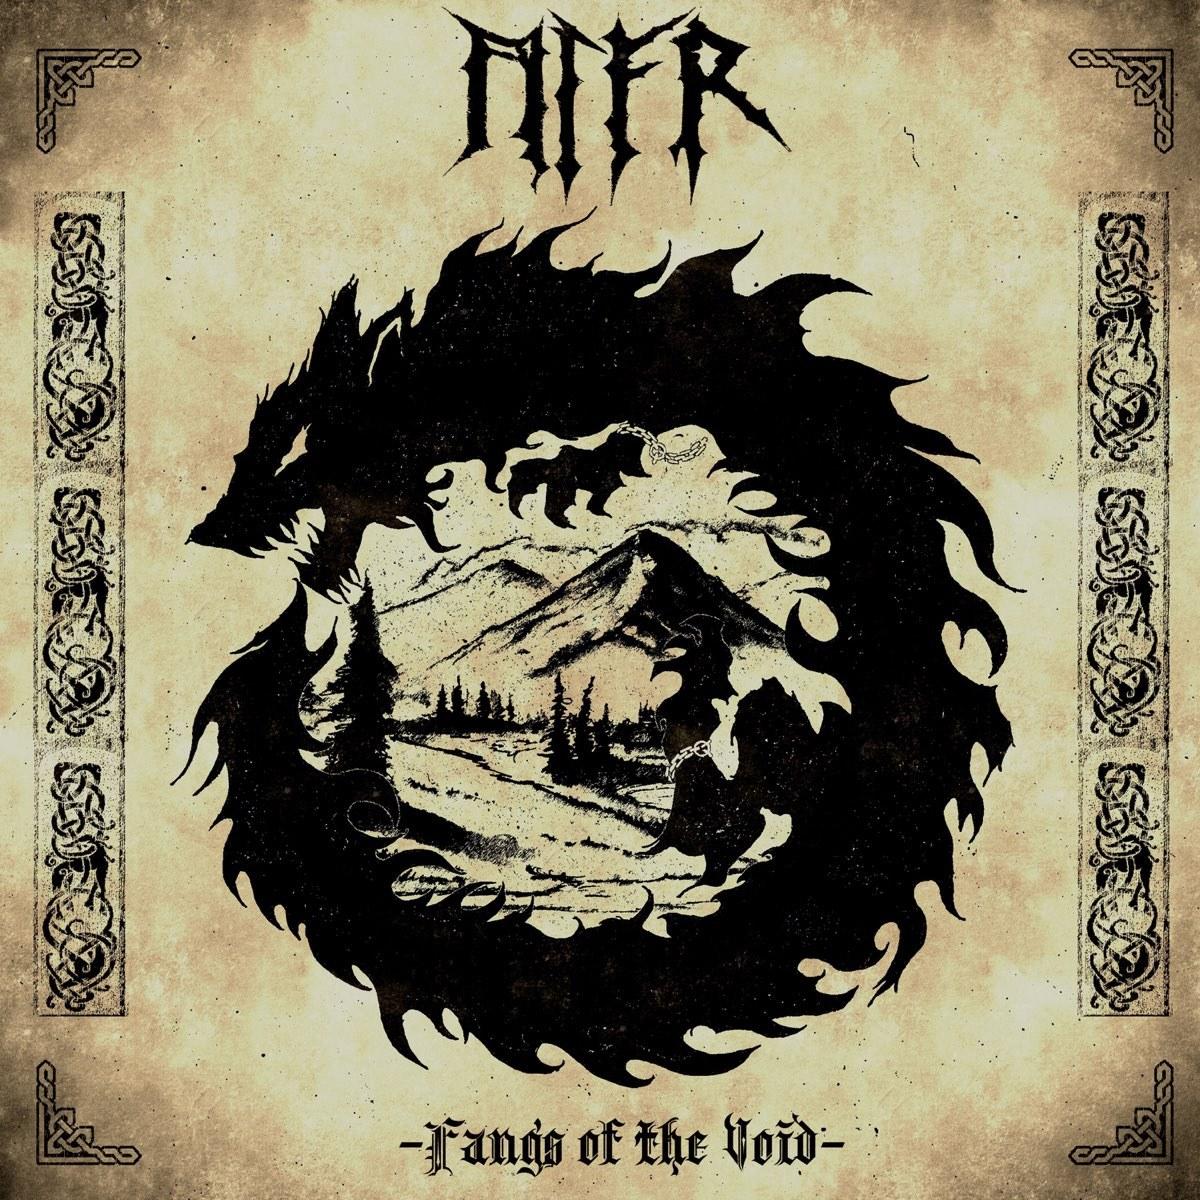 Úlfr - Fangs of the Void